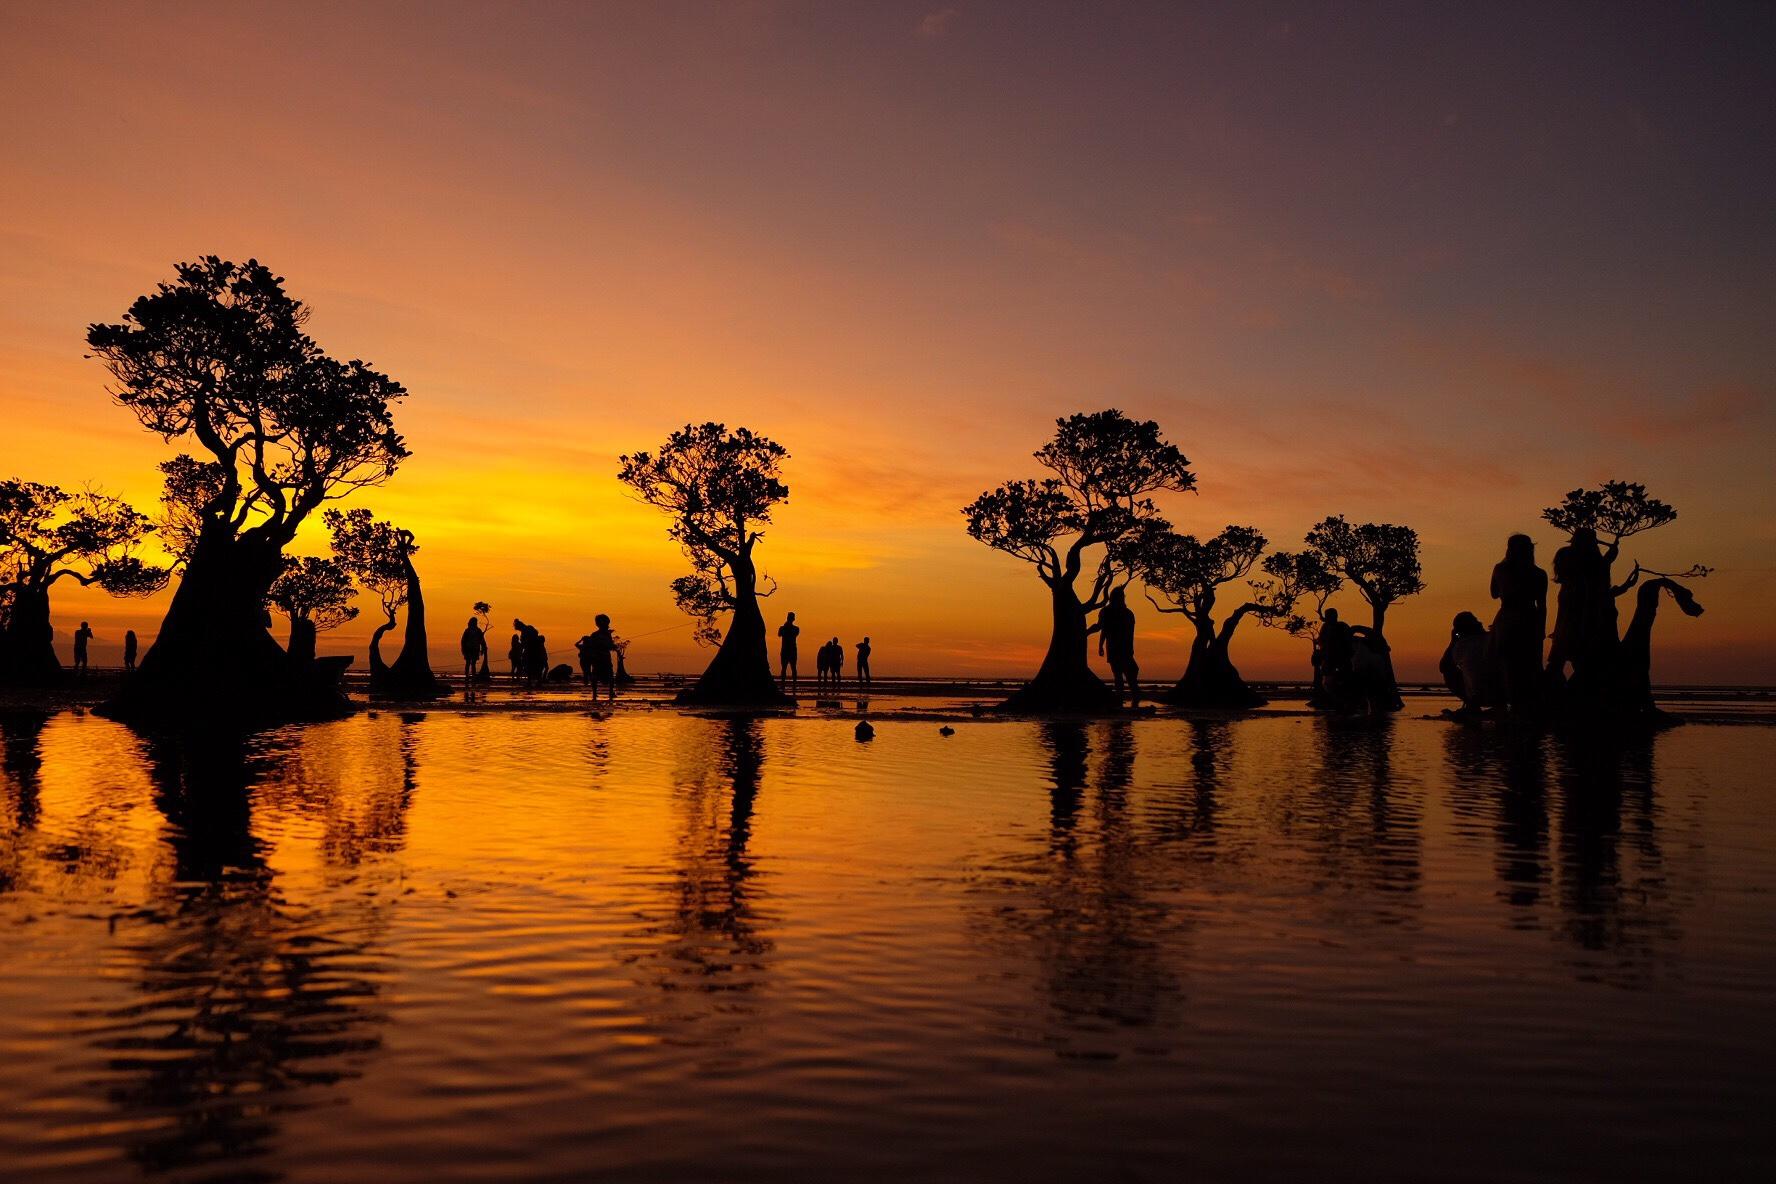 beautiful sunset in walakiri beach